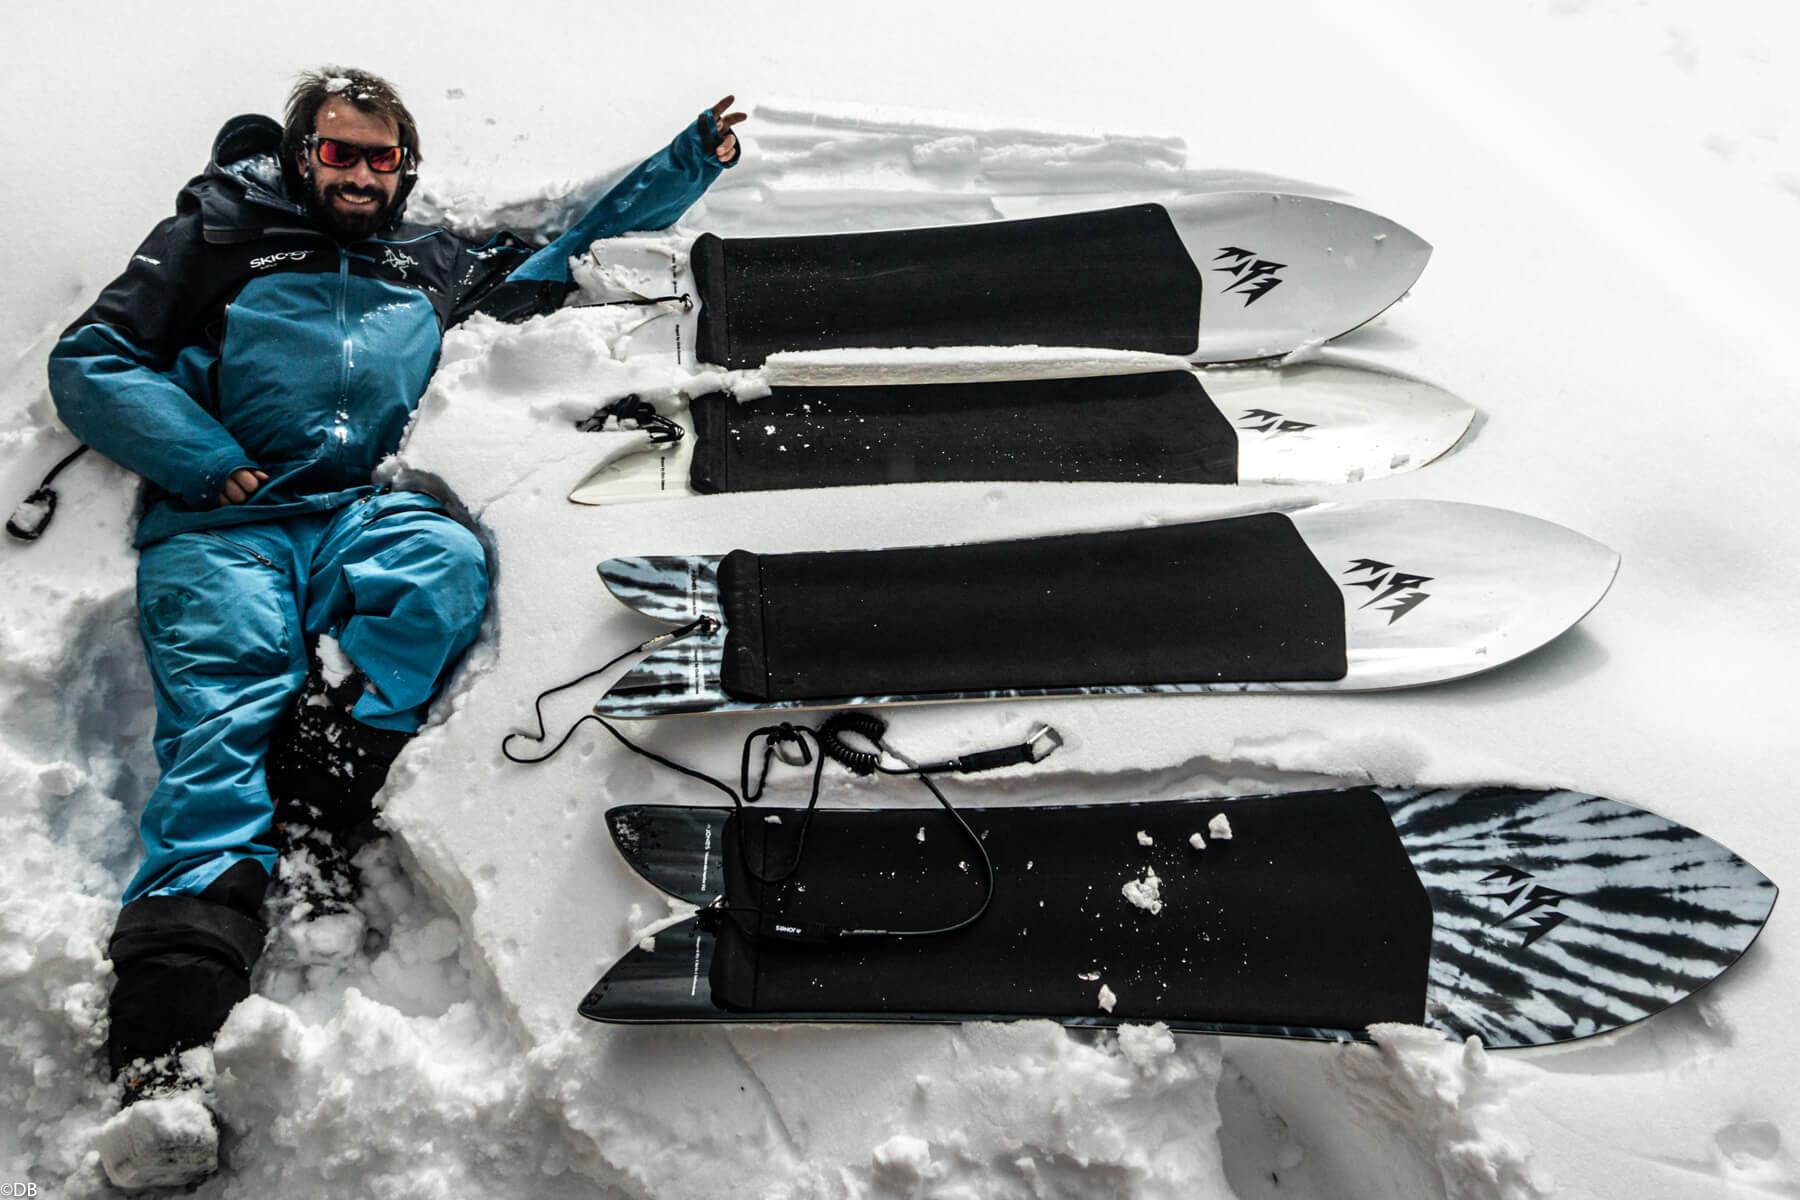 Jones Snowboard Mountain surfer 2021